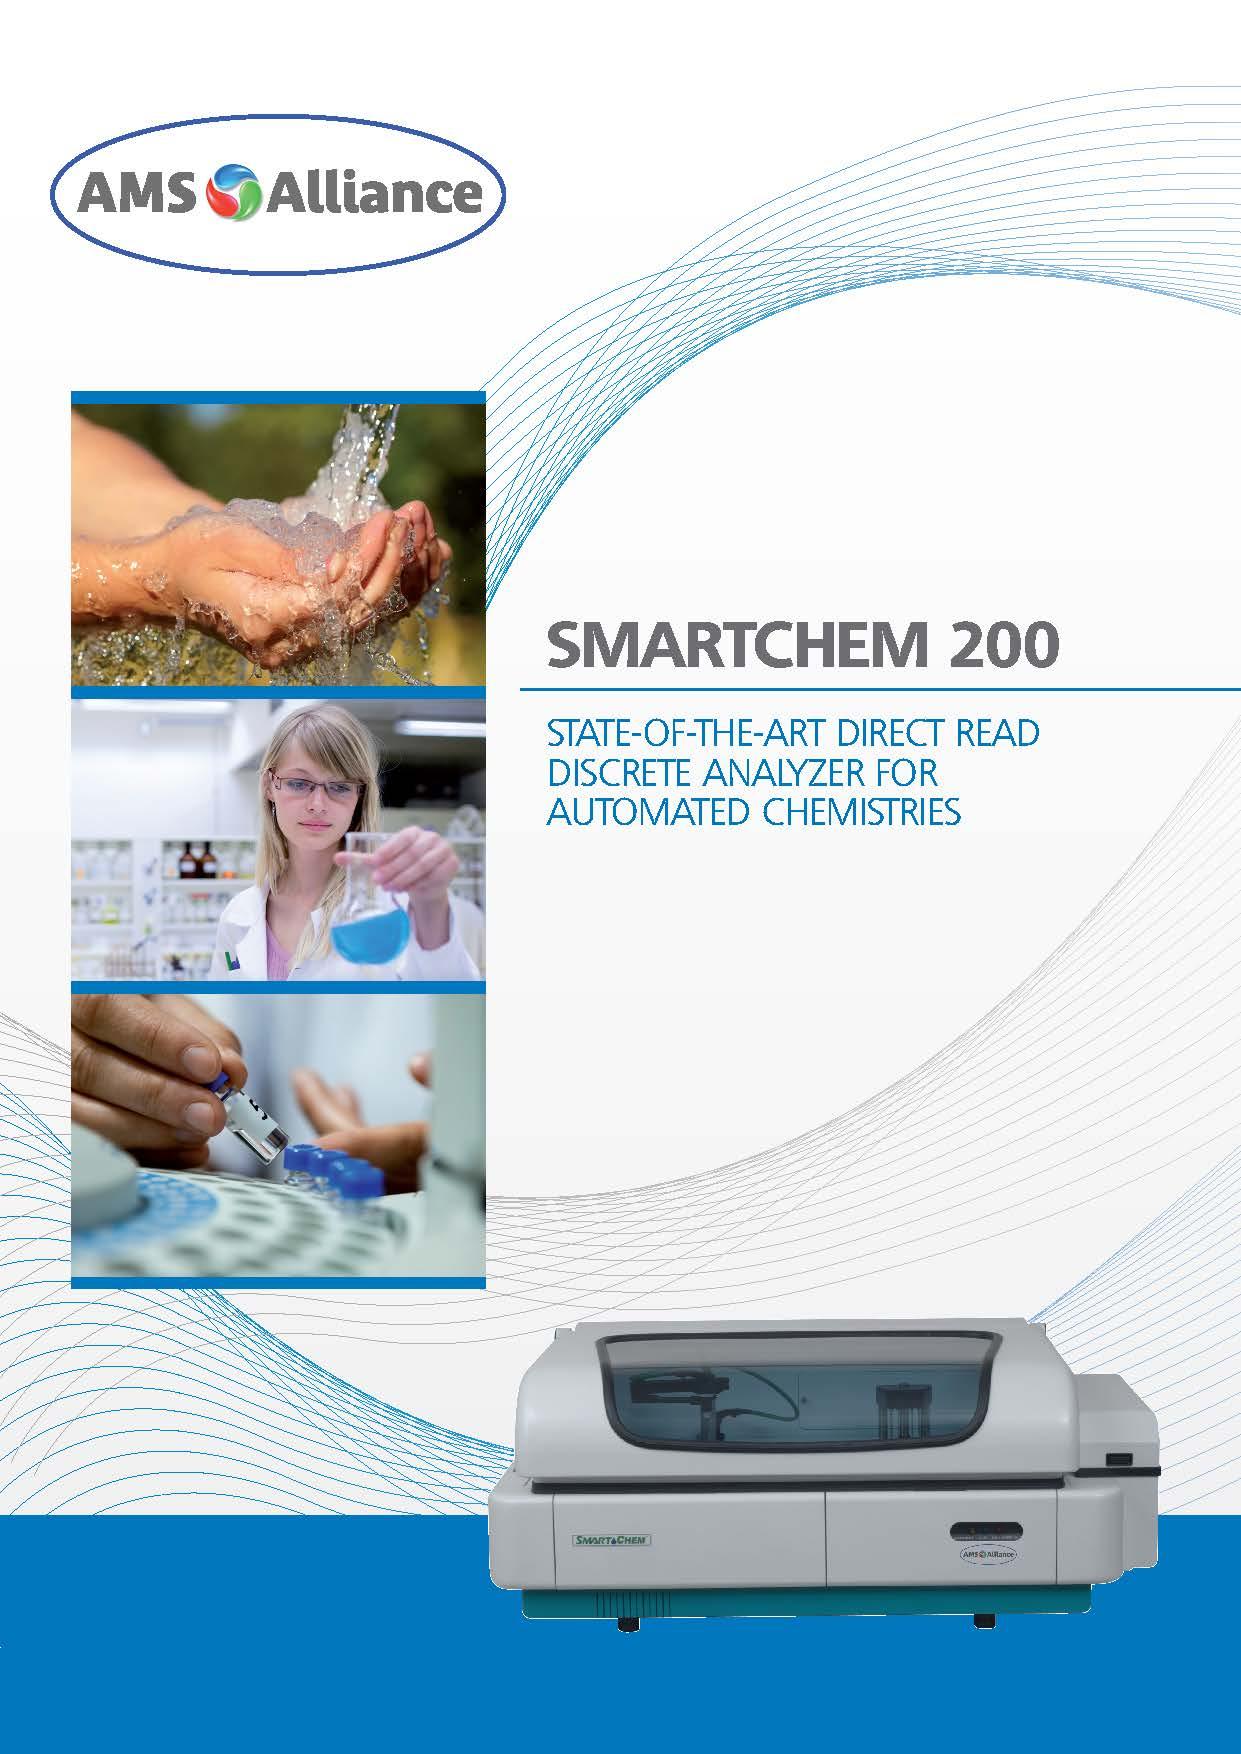 Smartchem 200